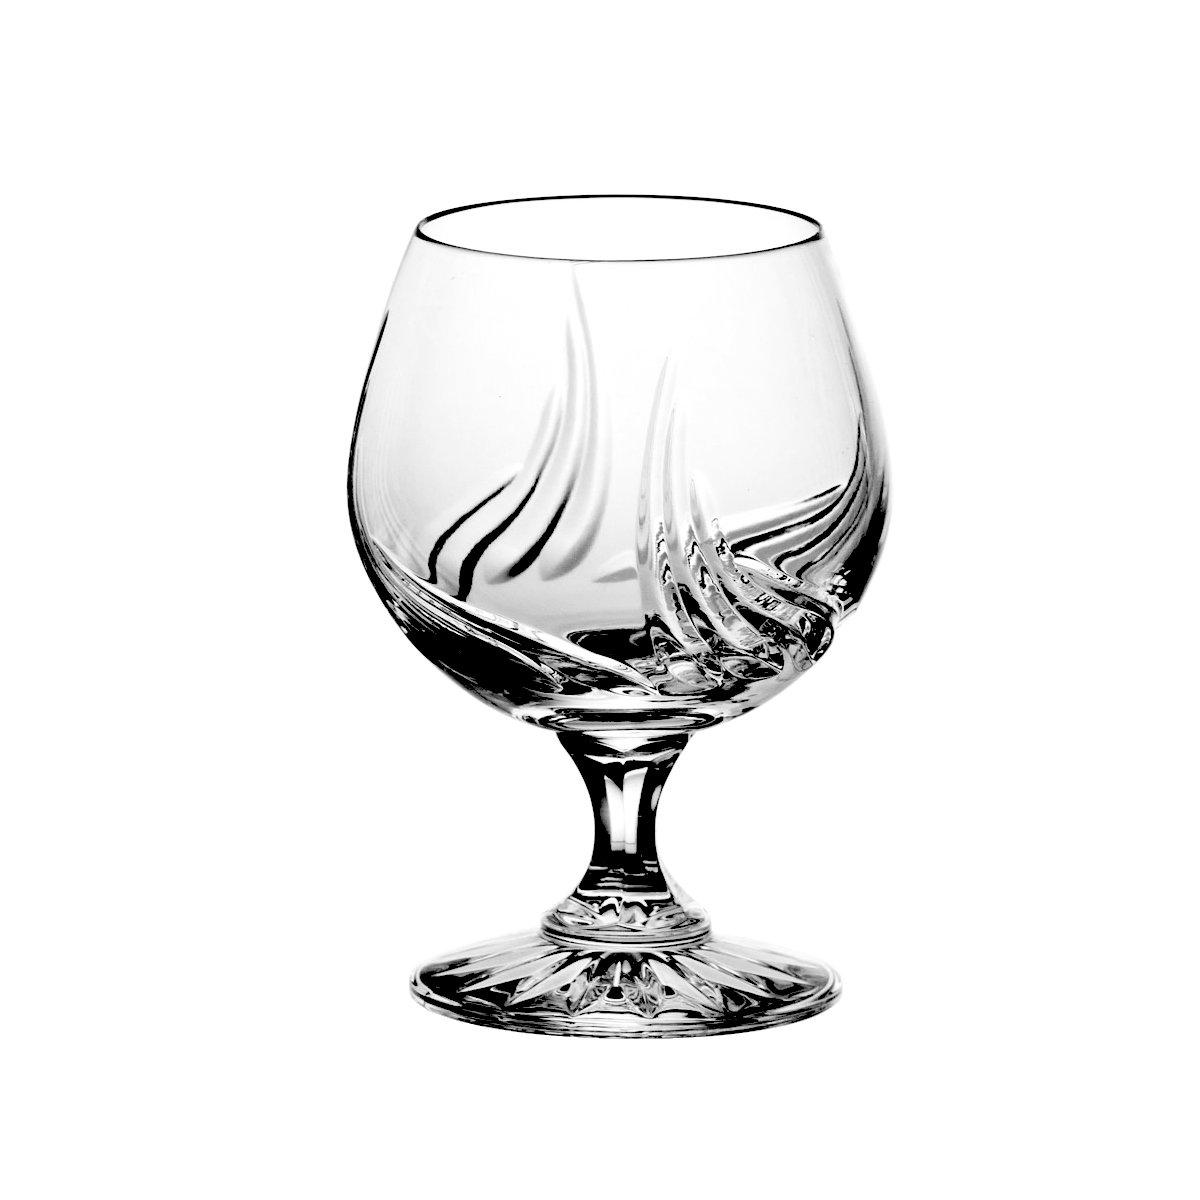 Crystaljulia 5794–Bicchieri Cognac vetro cristallo al piombo 6pezzi, 250ml